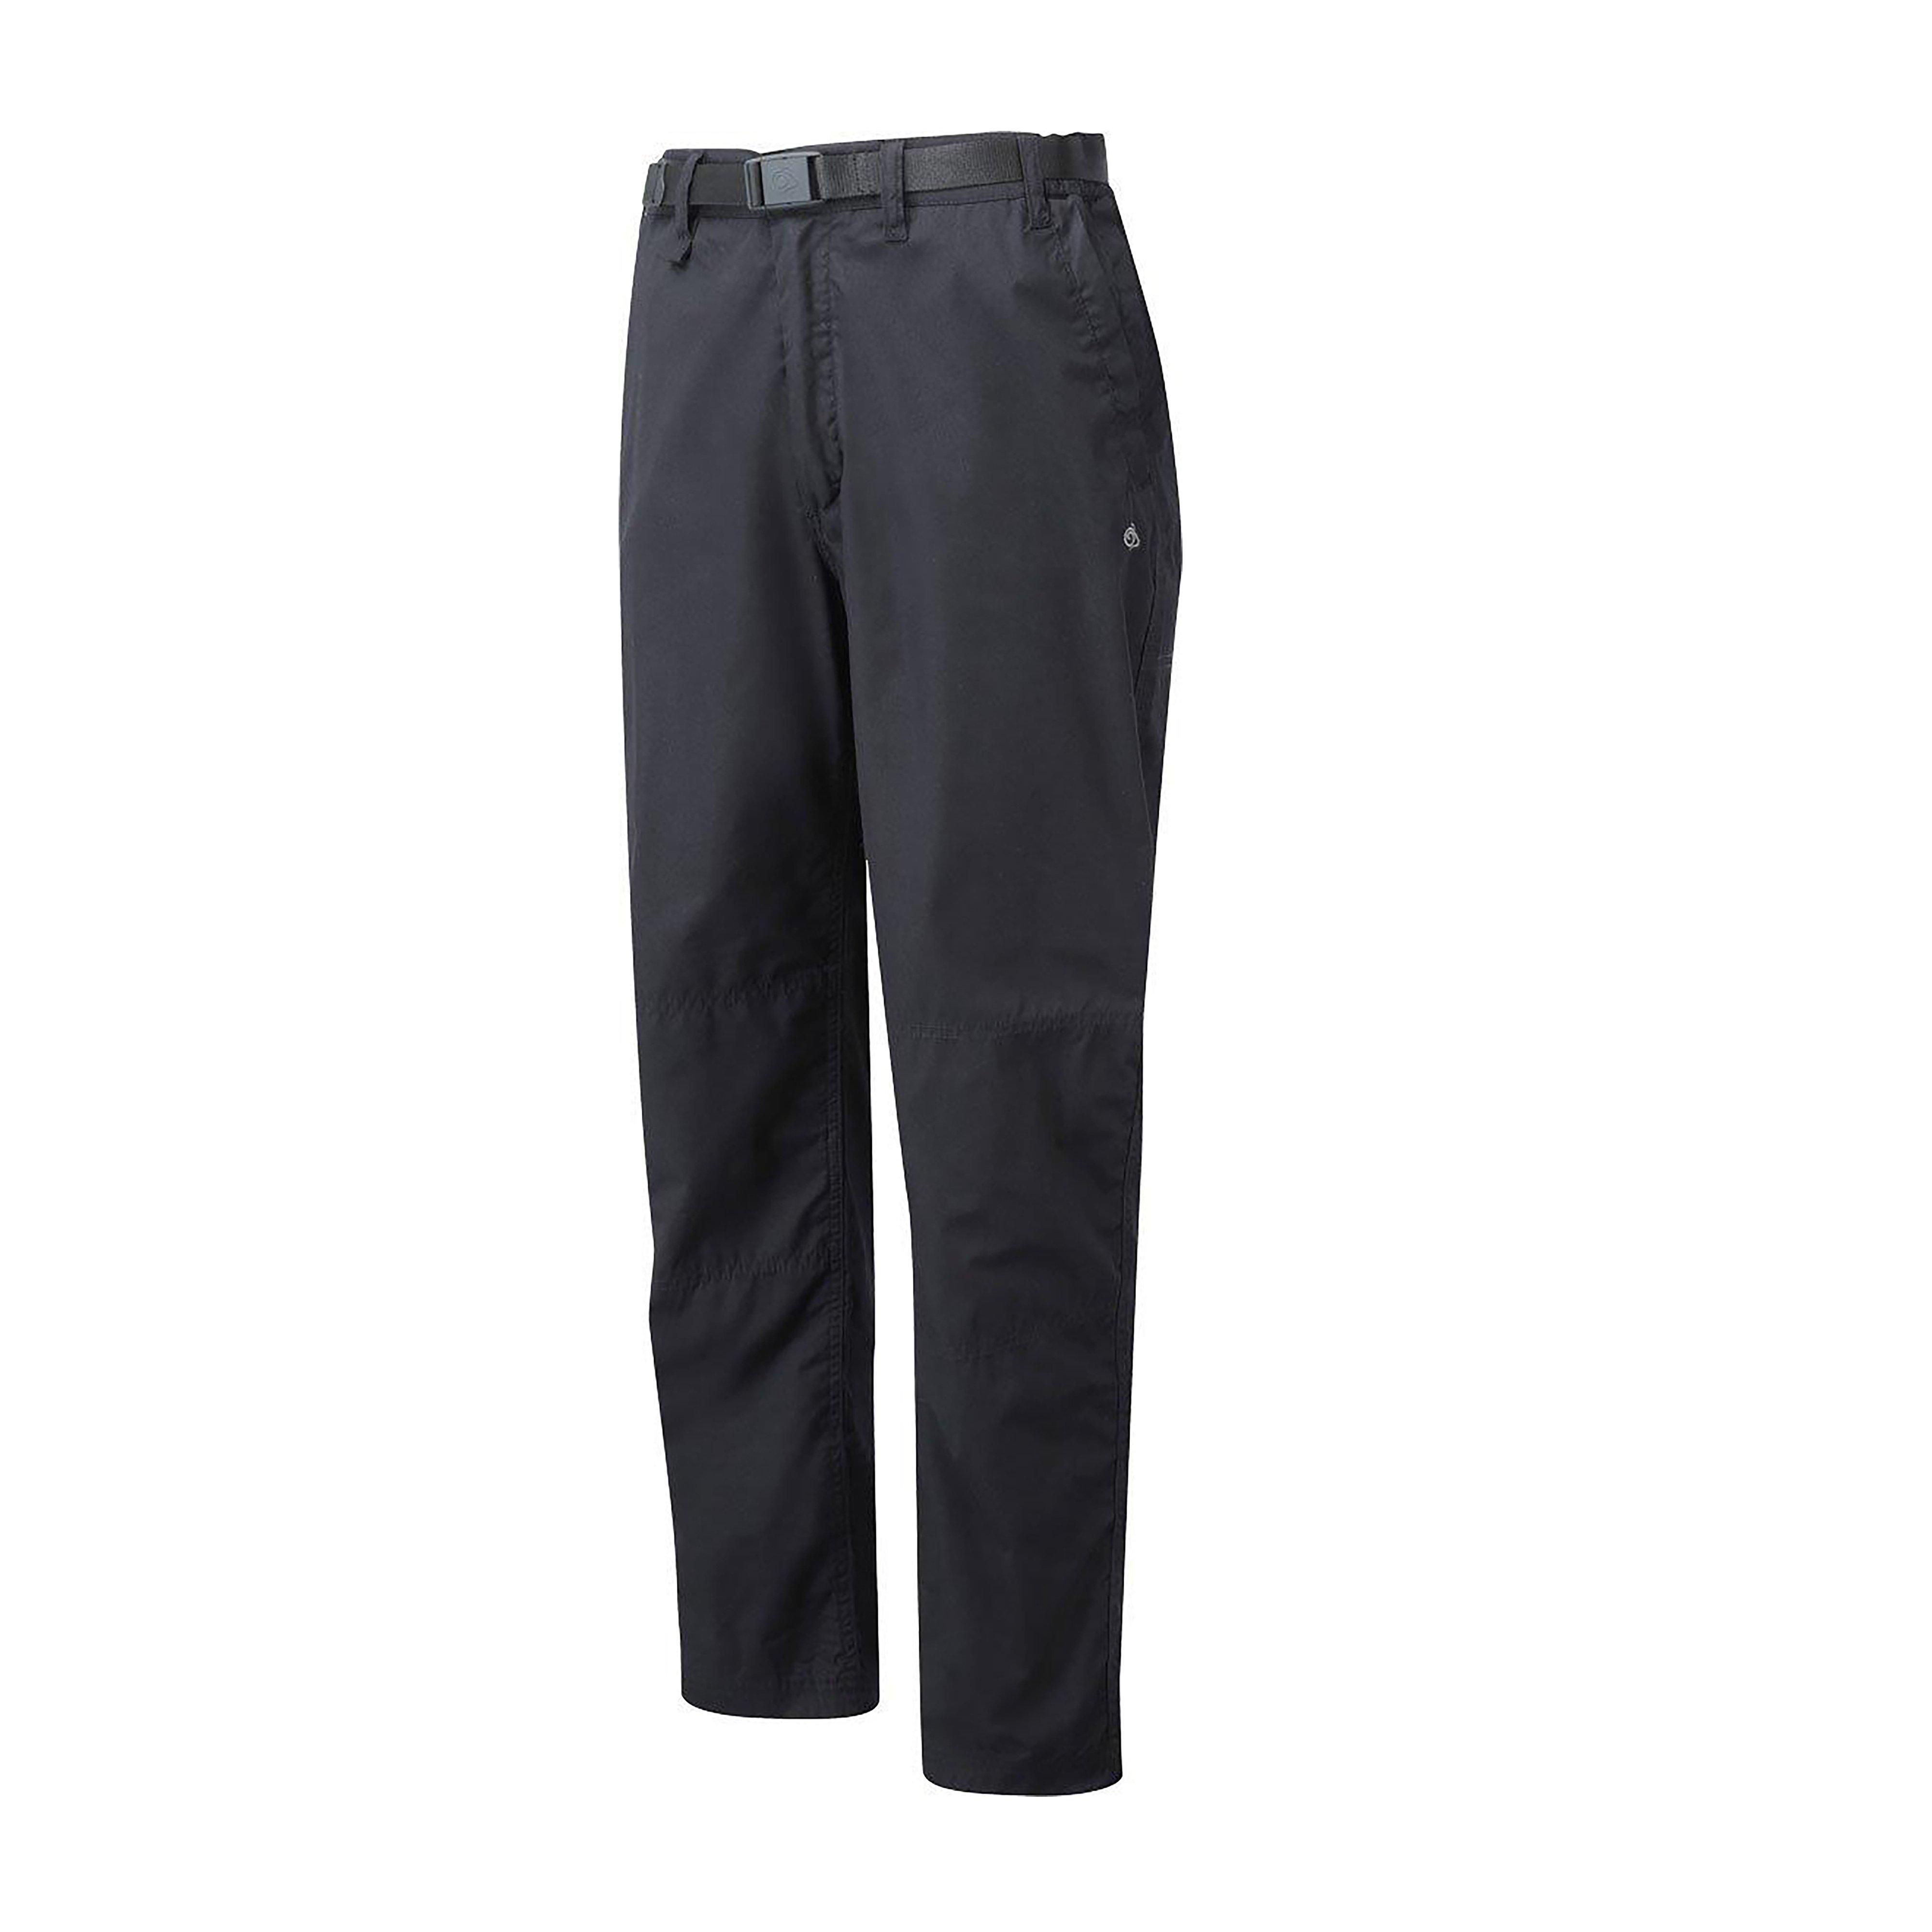 Craghoppers Mens Classic Kiwi Trousers Black